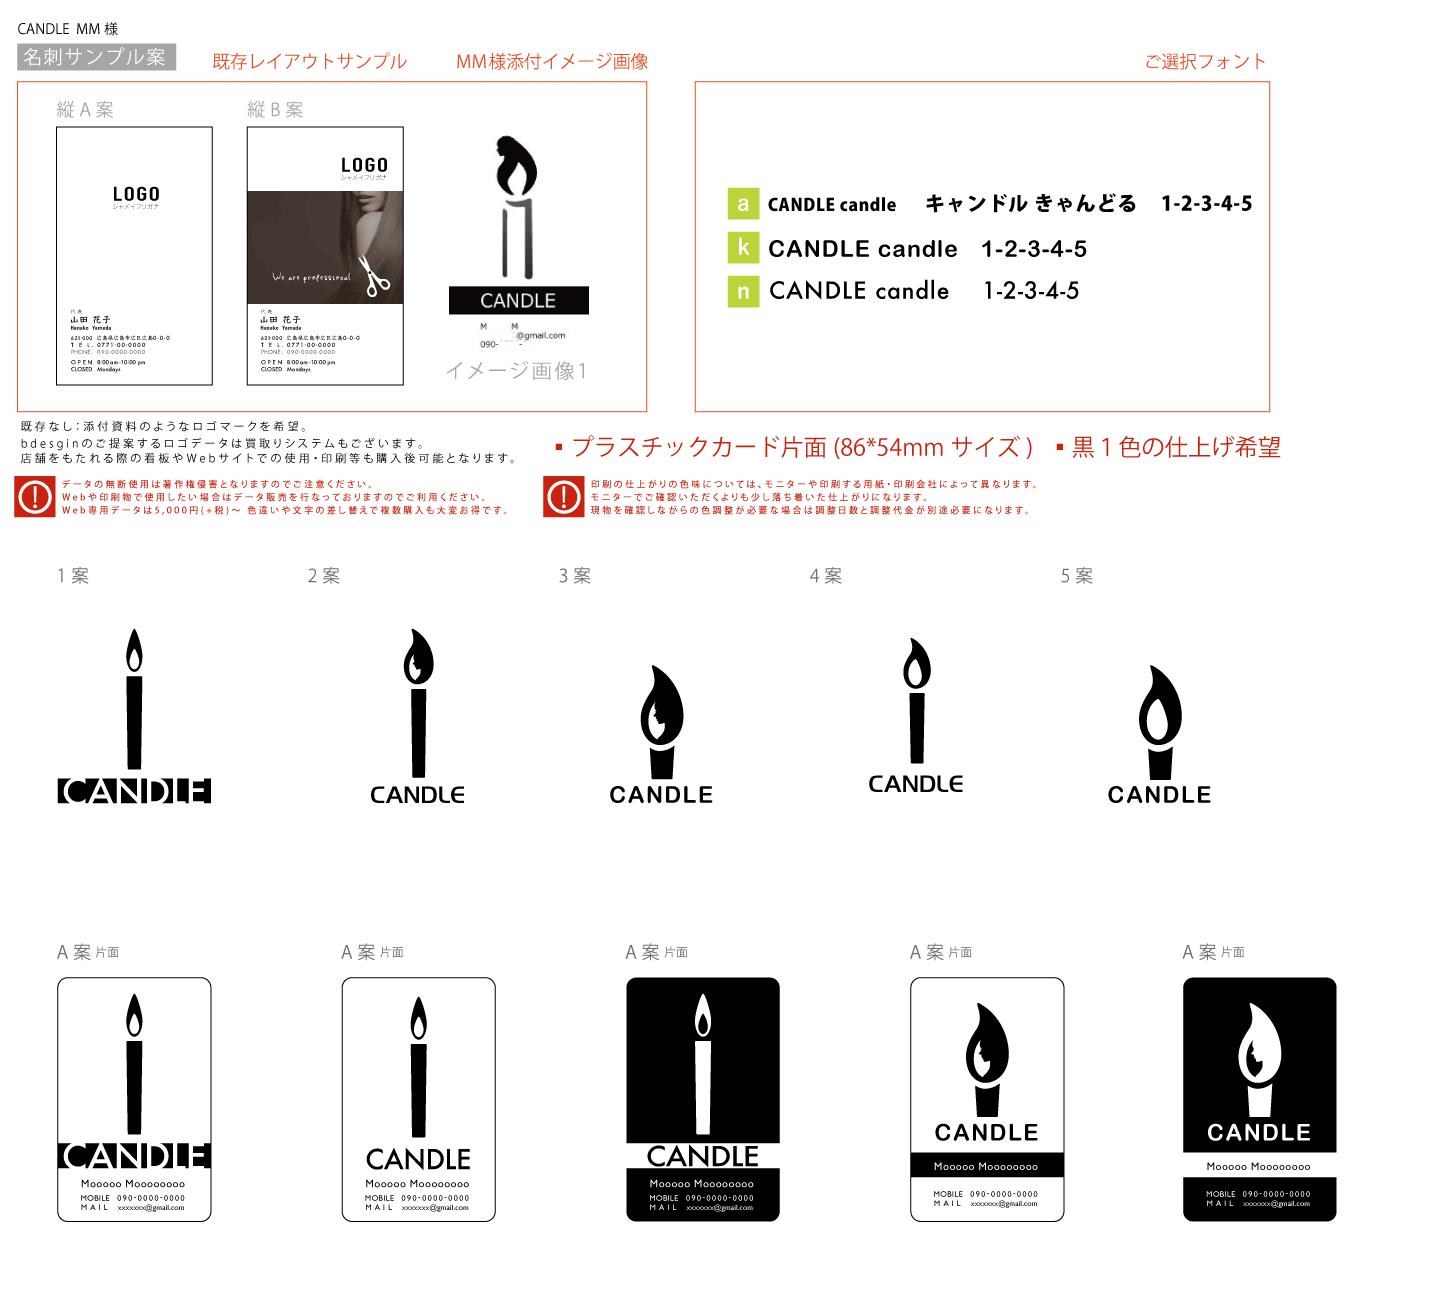 CANDLE MM様名刺サンプル案